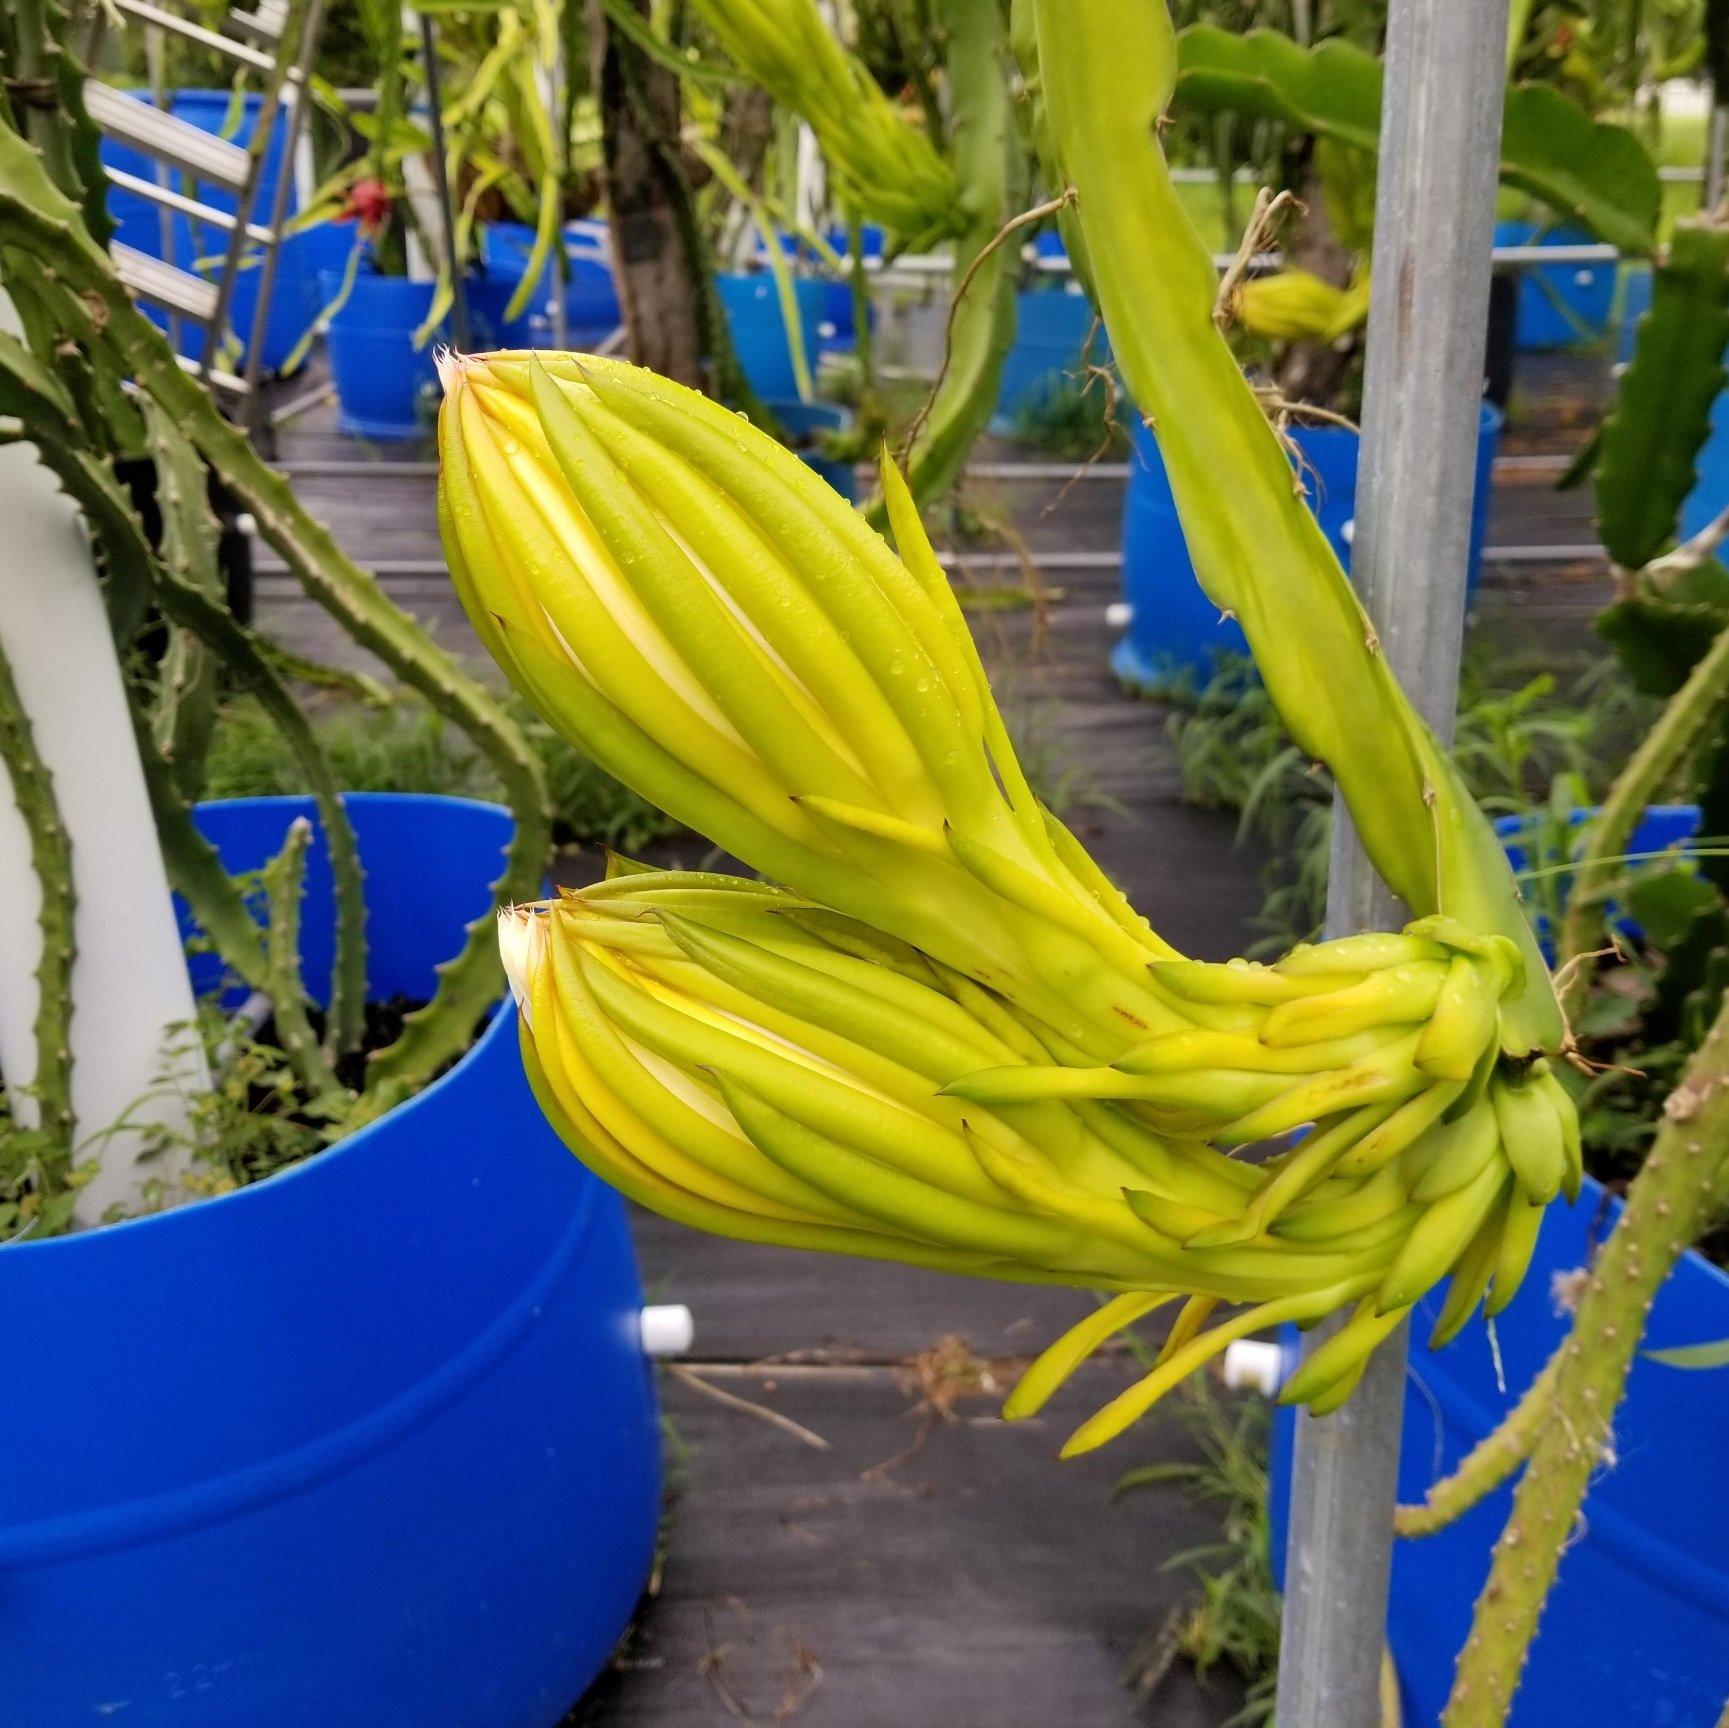 Capistrano Valley Dragon Fruit Flower Bud